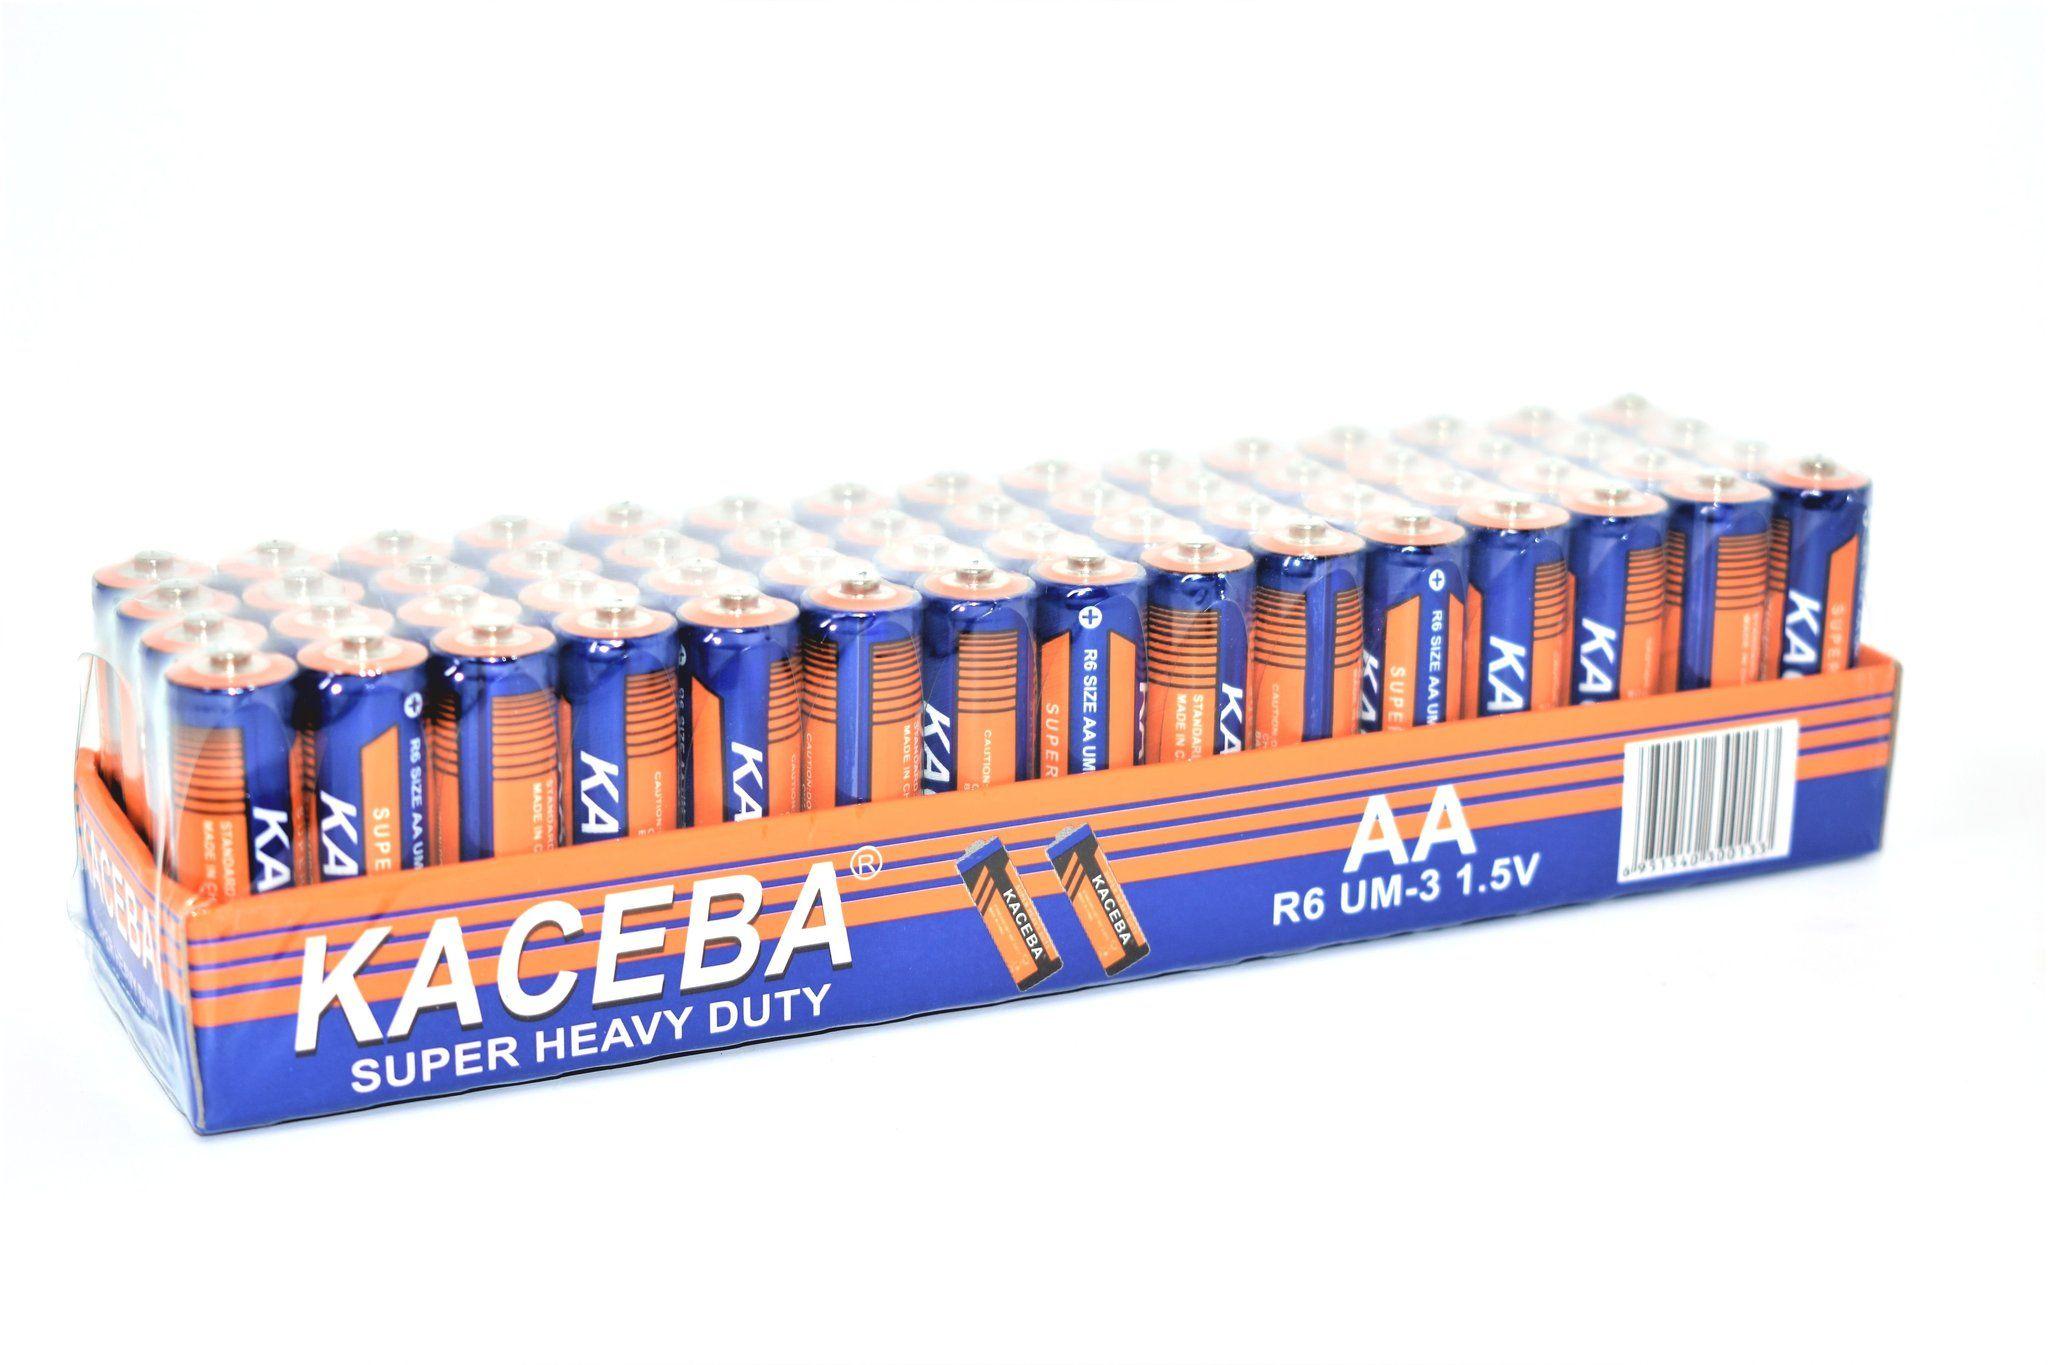 Kaceba Super Heavy Duty Aa Batteries 60 Pack Marketcol Heavy Duty Heavy Super